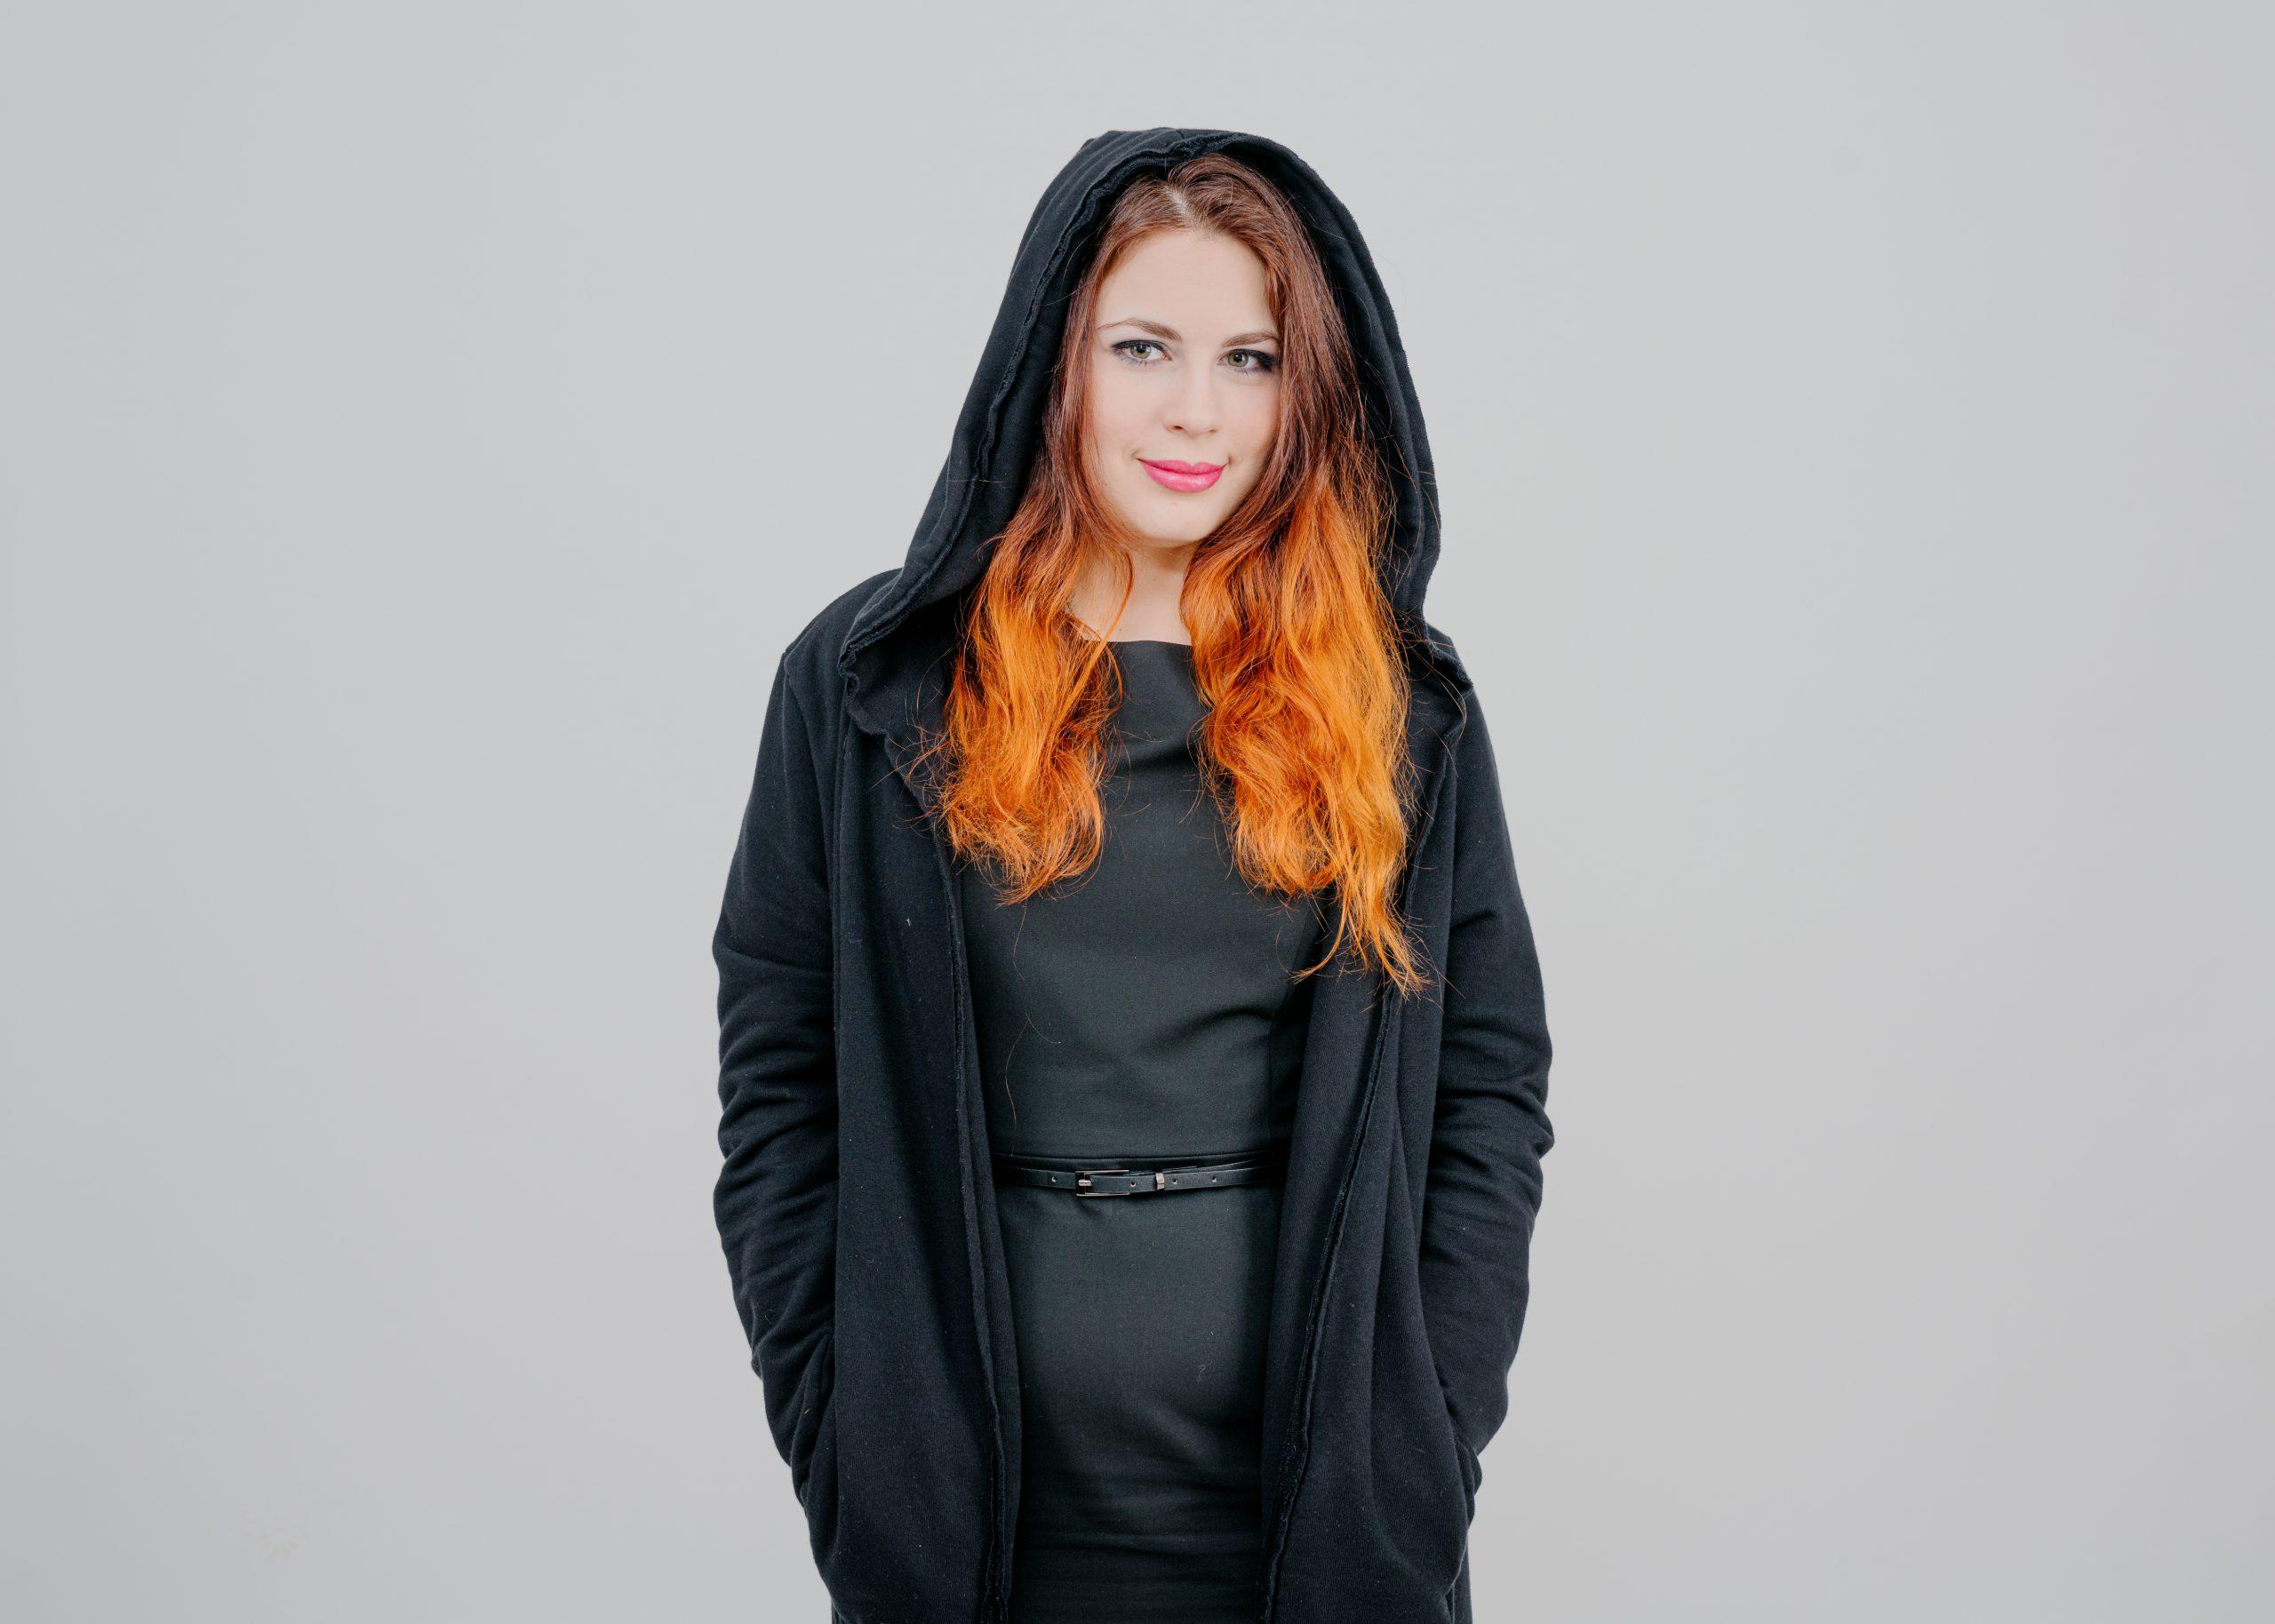 Natalia Trojanowska